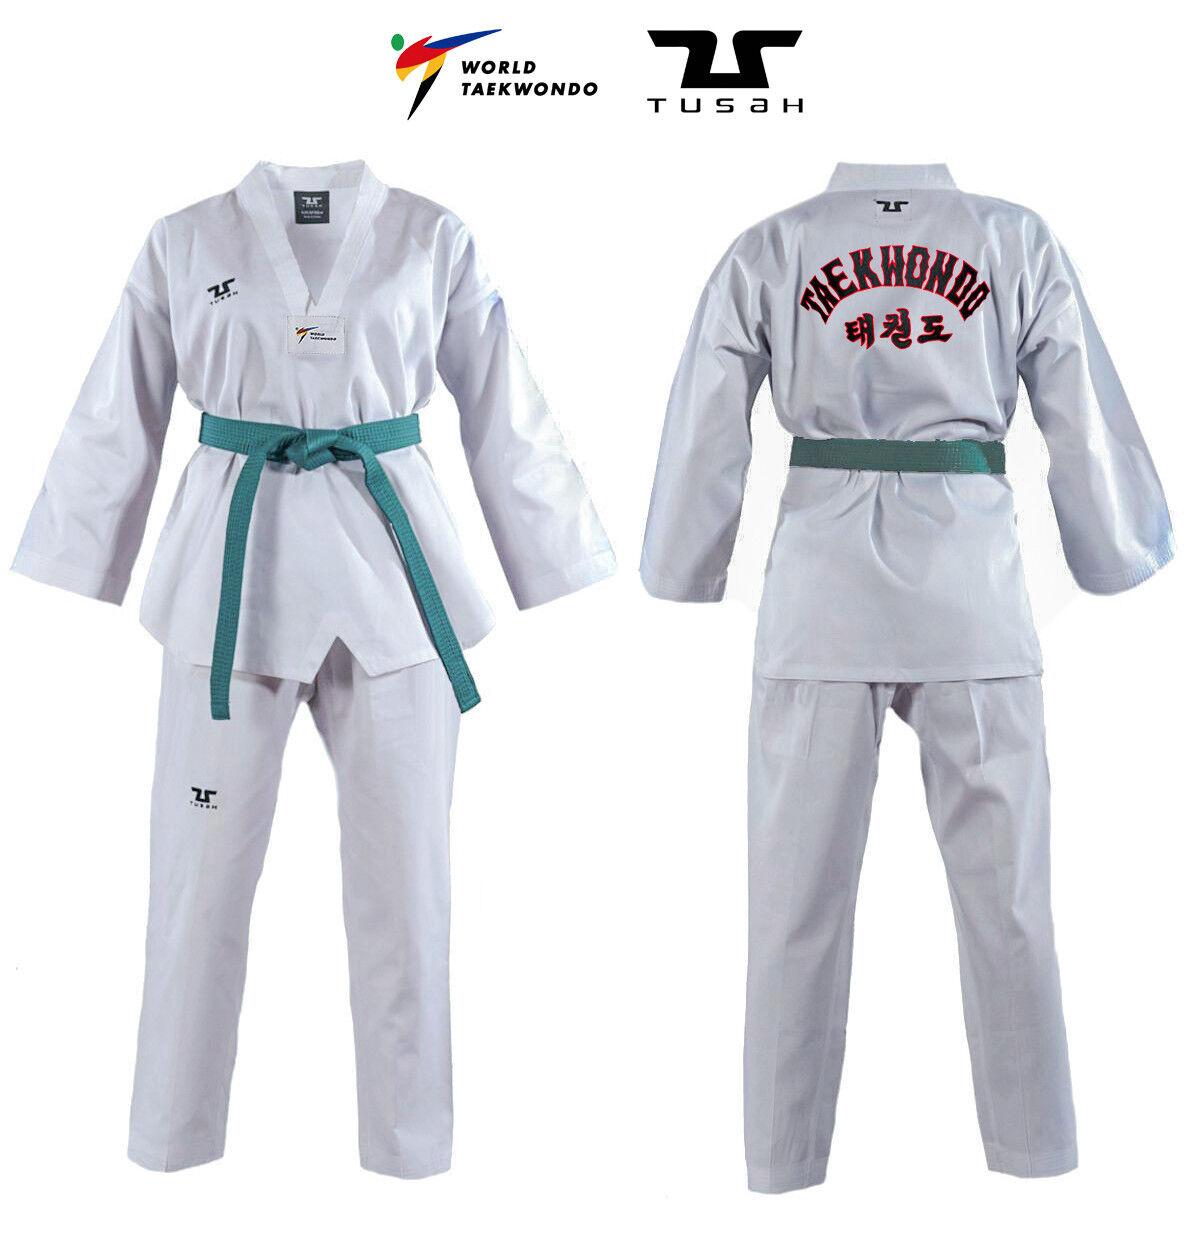 Tusah - Dobok Basic Uniform Uniform Uniform per Taekwondo con Ricamo su schiena Omologato WTF b9c1b6